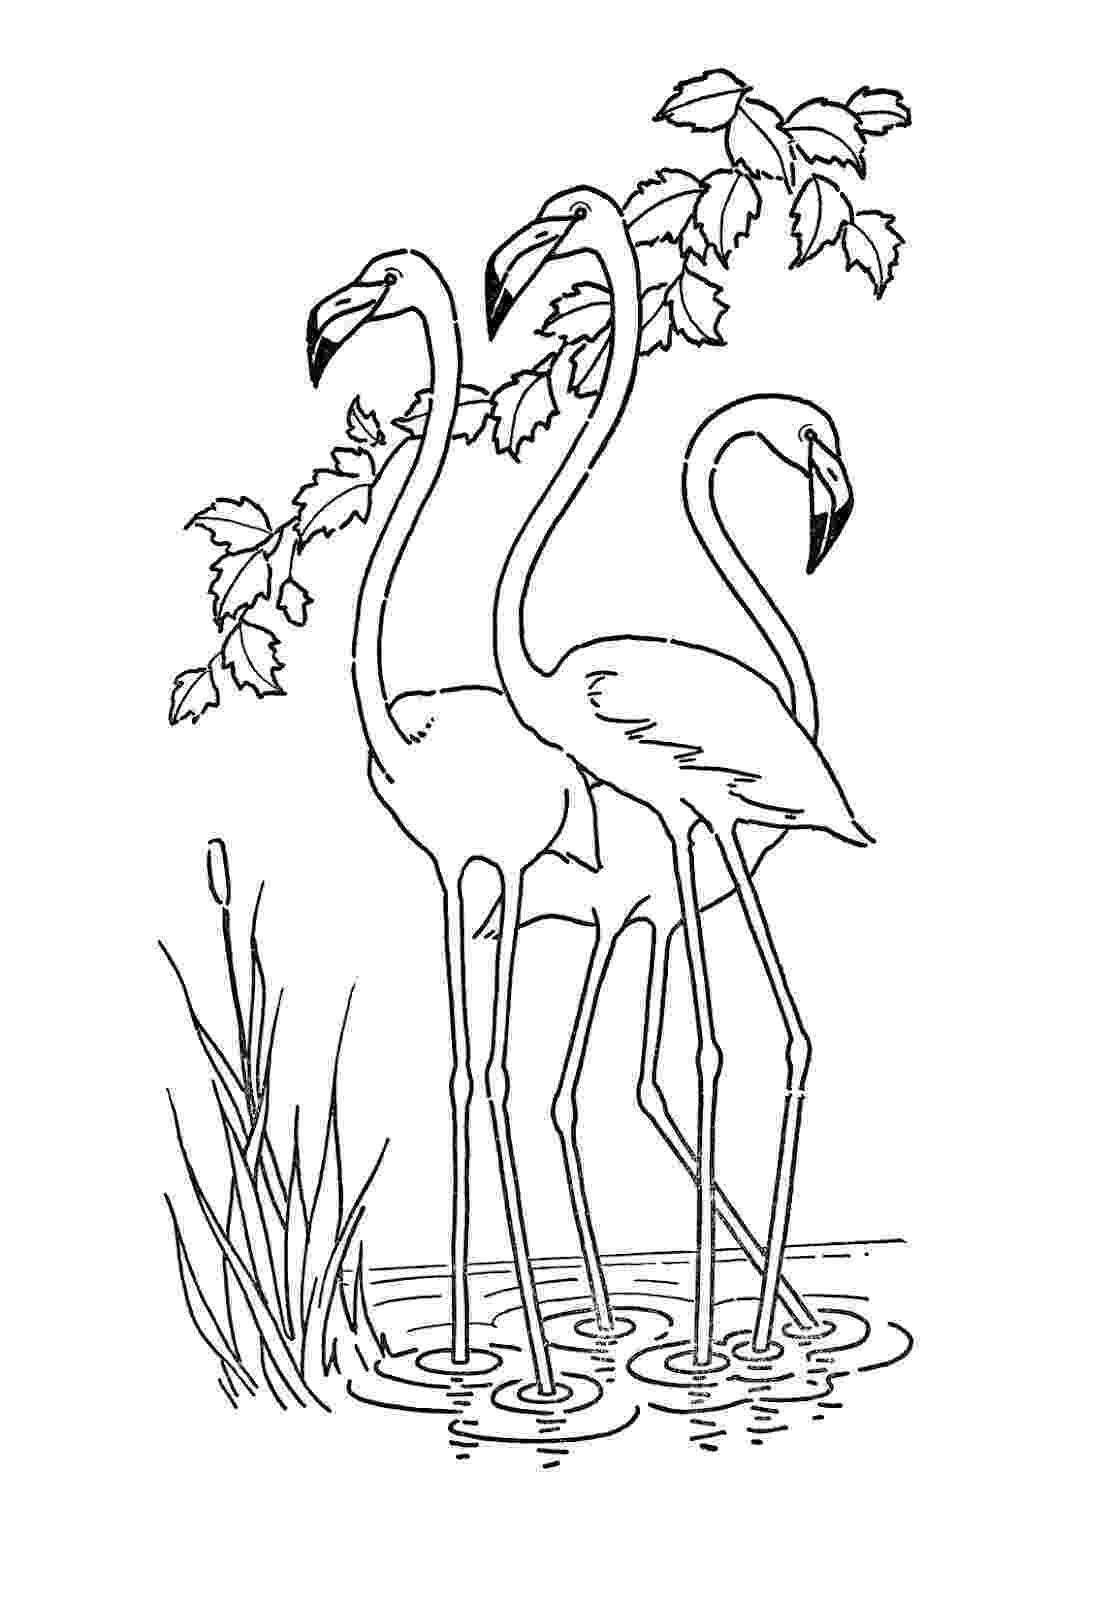 flamingo coloring sheet flamingo coloring page free printable coloring video flamingo coloring sheet